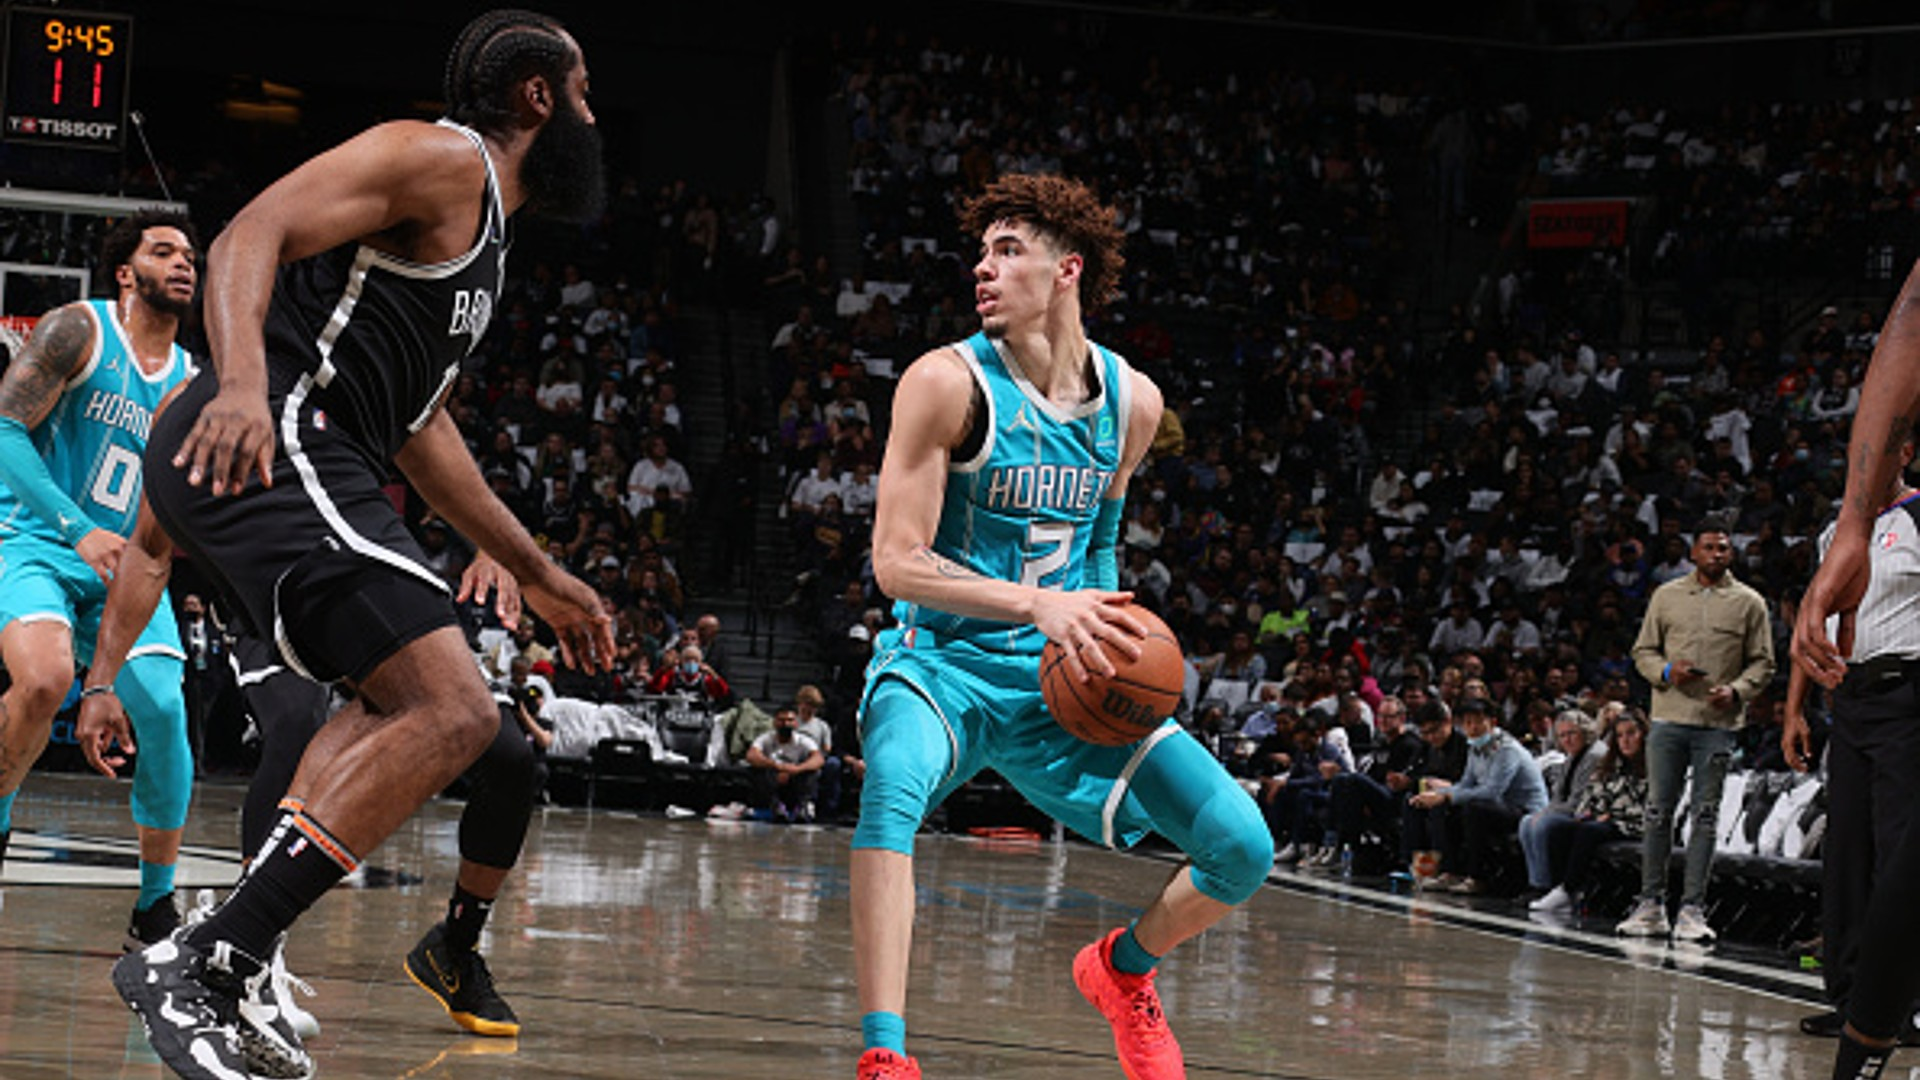 Game Recap: Hornets 111, Nets 95